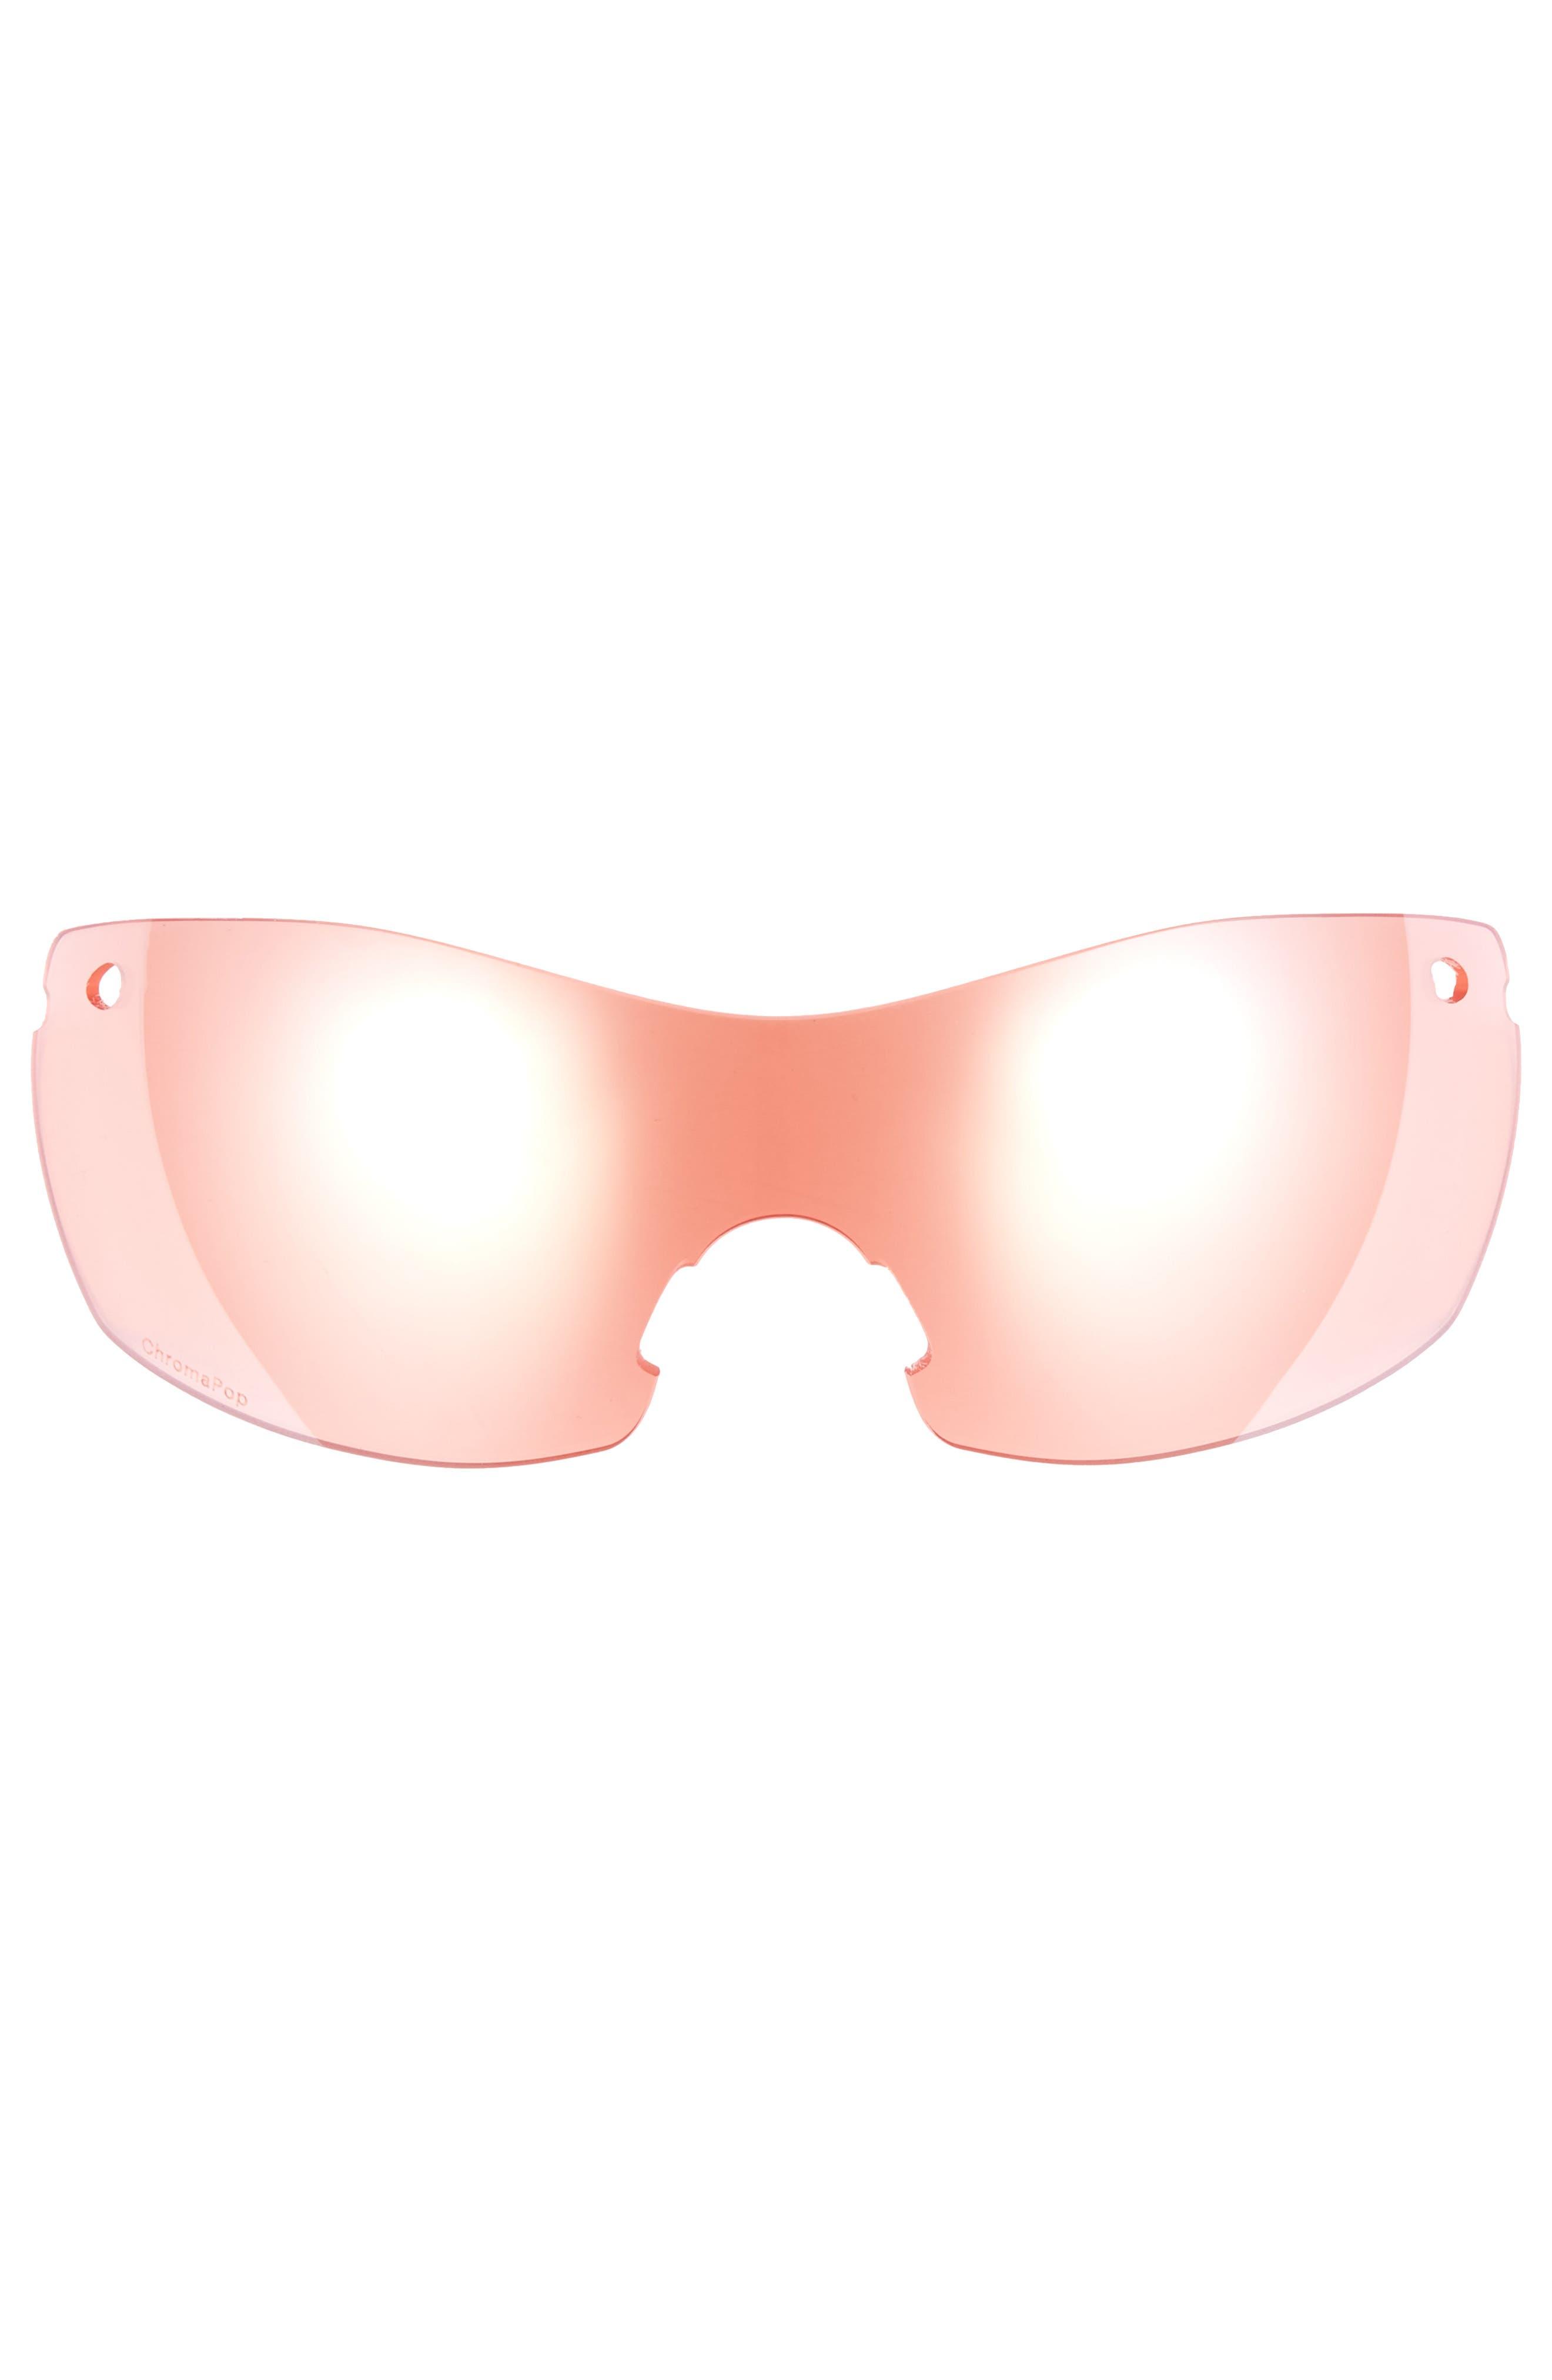 PivLock<sup>™</sup> Asana 150mm ChromaPop Polarized Sunglasses,                             Alternate thumbnail 13, color,